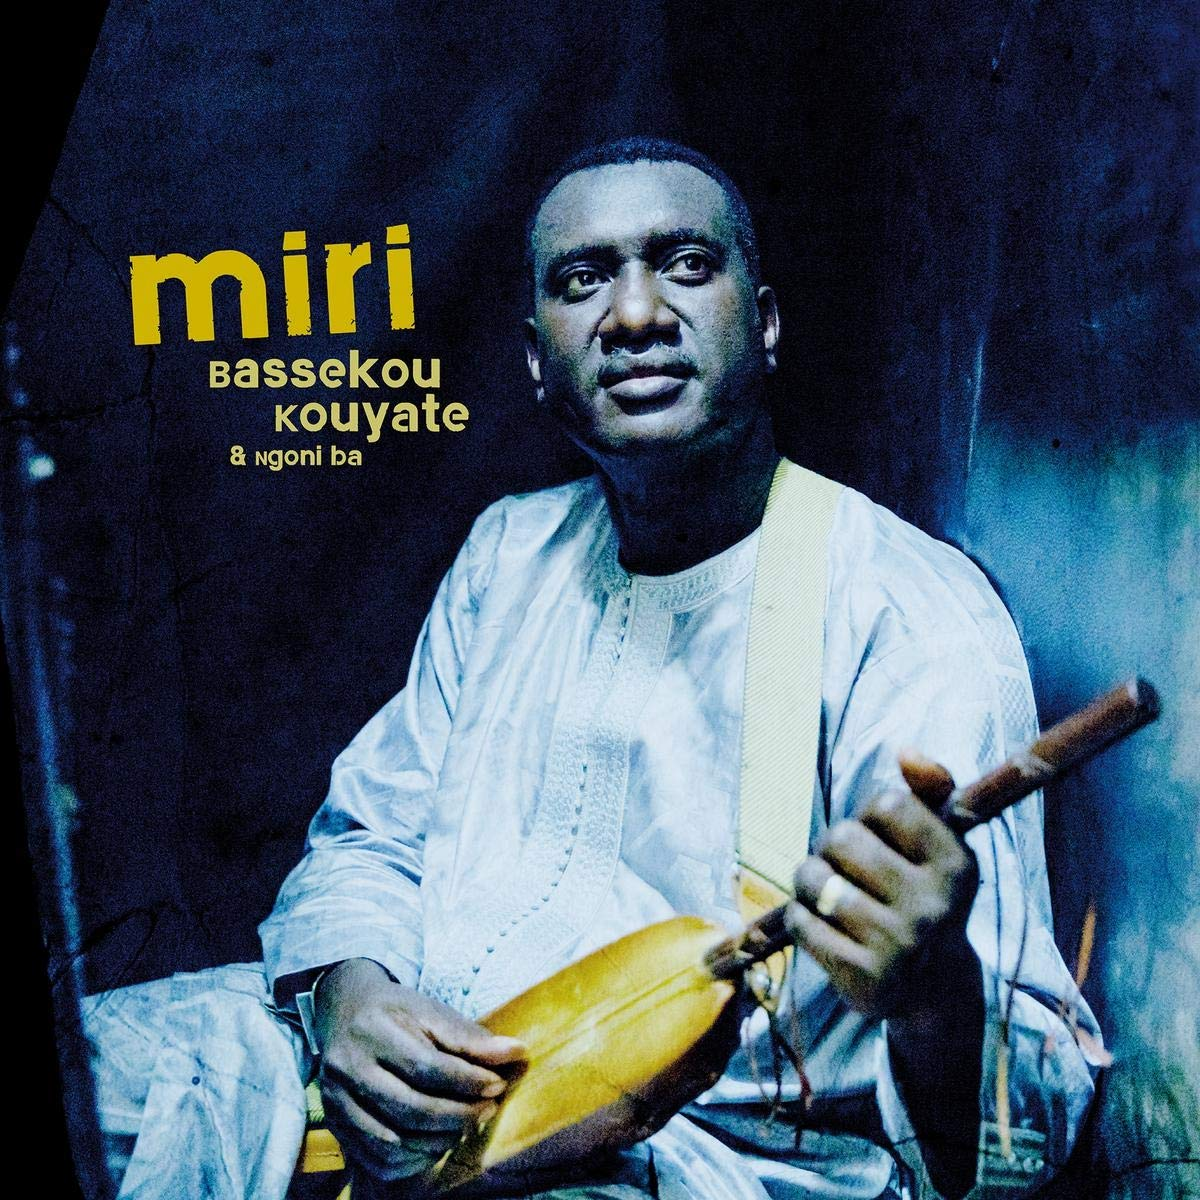 Vinilo : Bassekou Kouyate & Ngoni Ba - Miri (LP Vinyl)